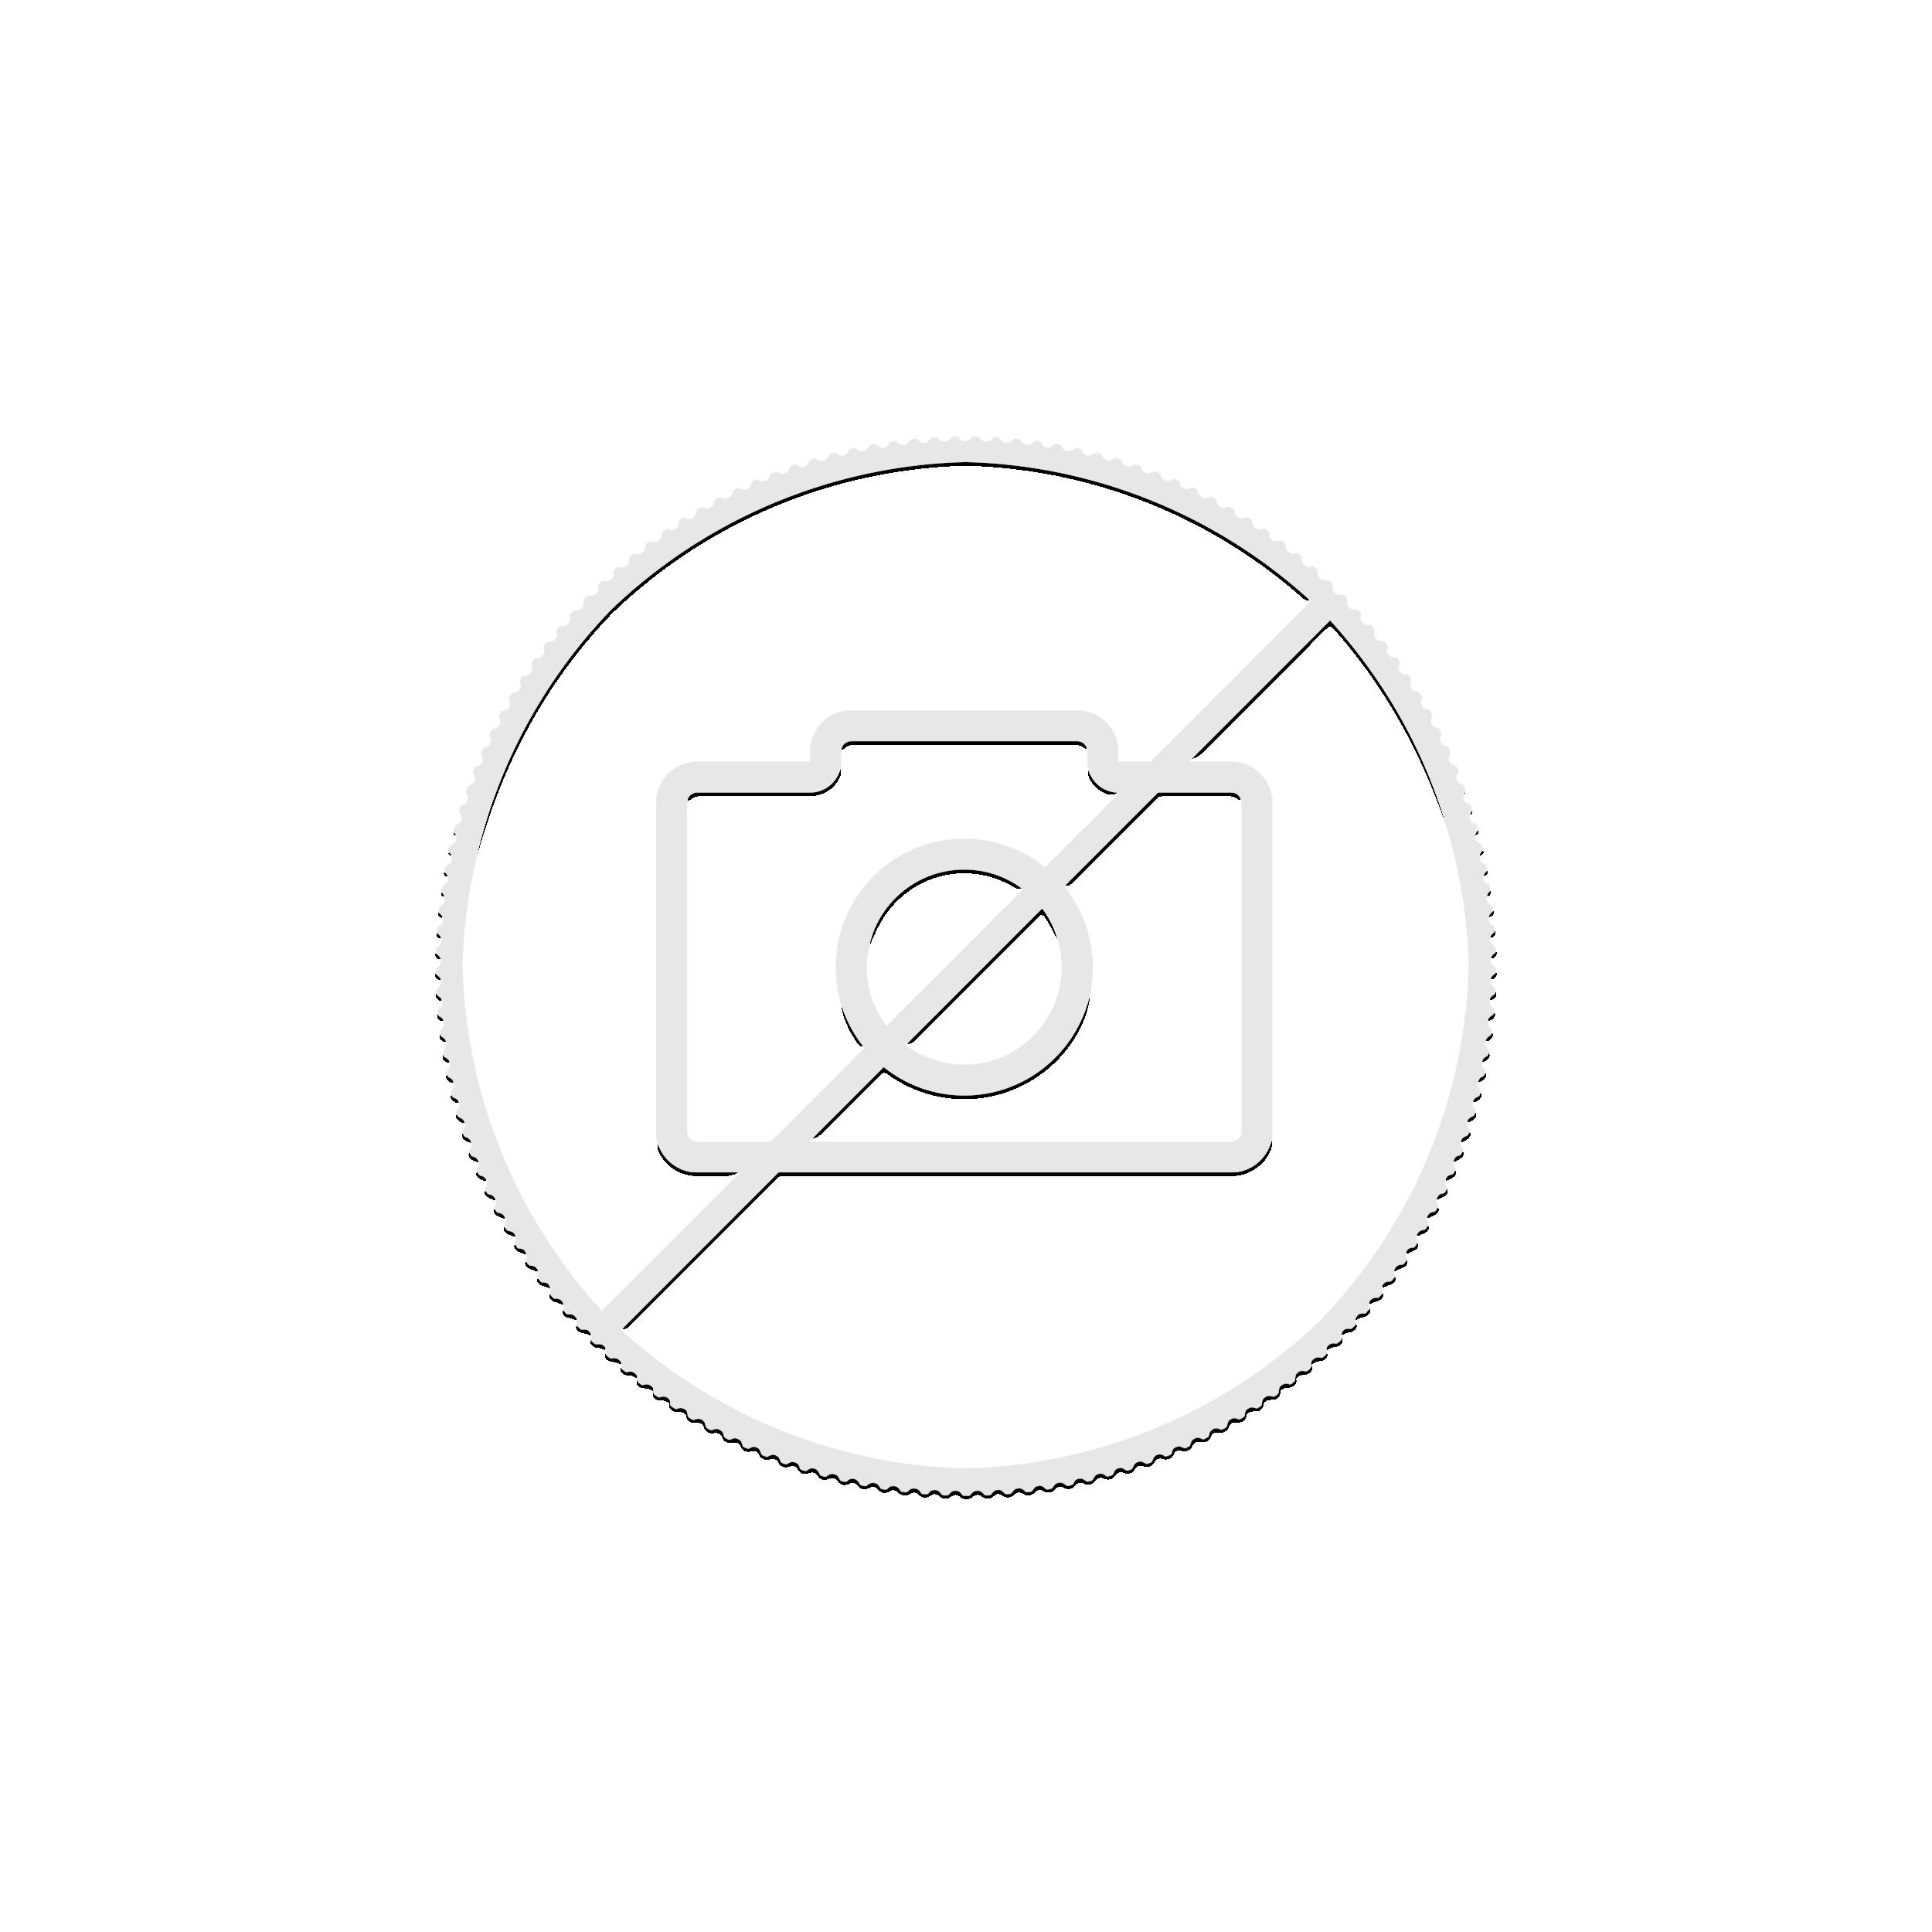 1 Troy ounce zilveren munt Royal Arms 2019 achterzijde